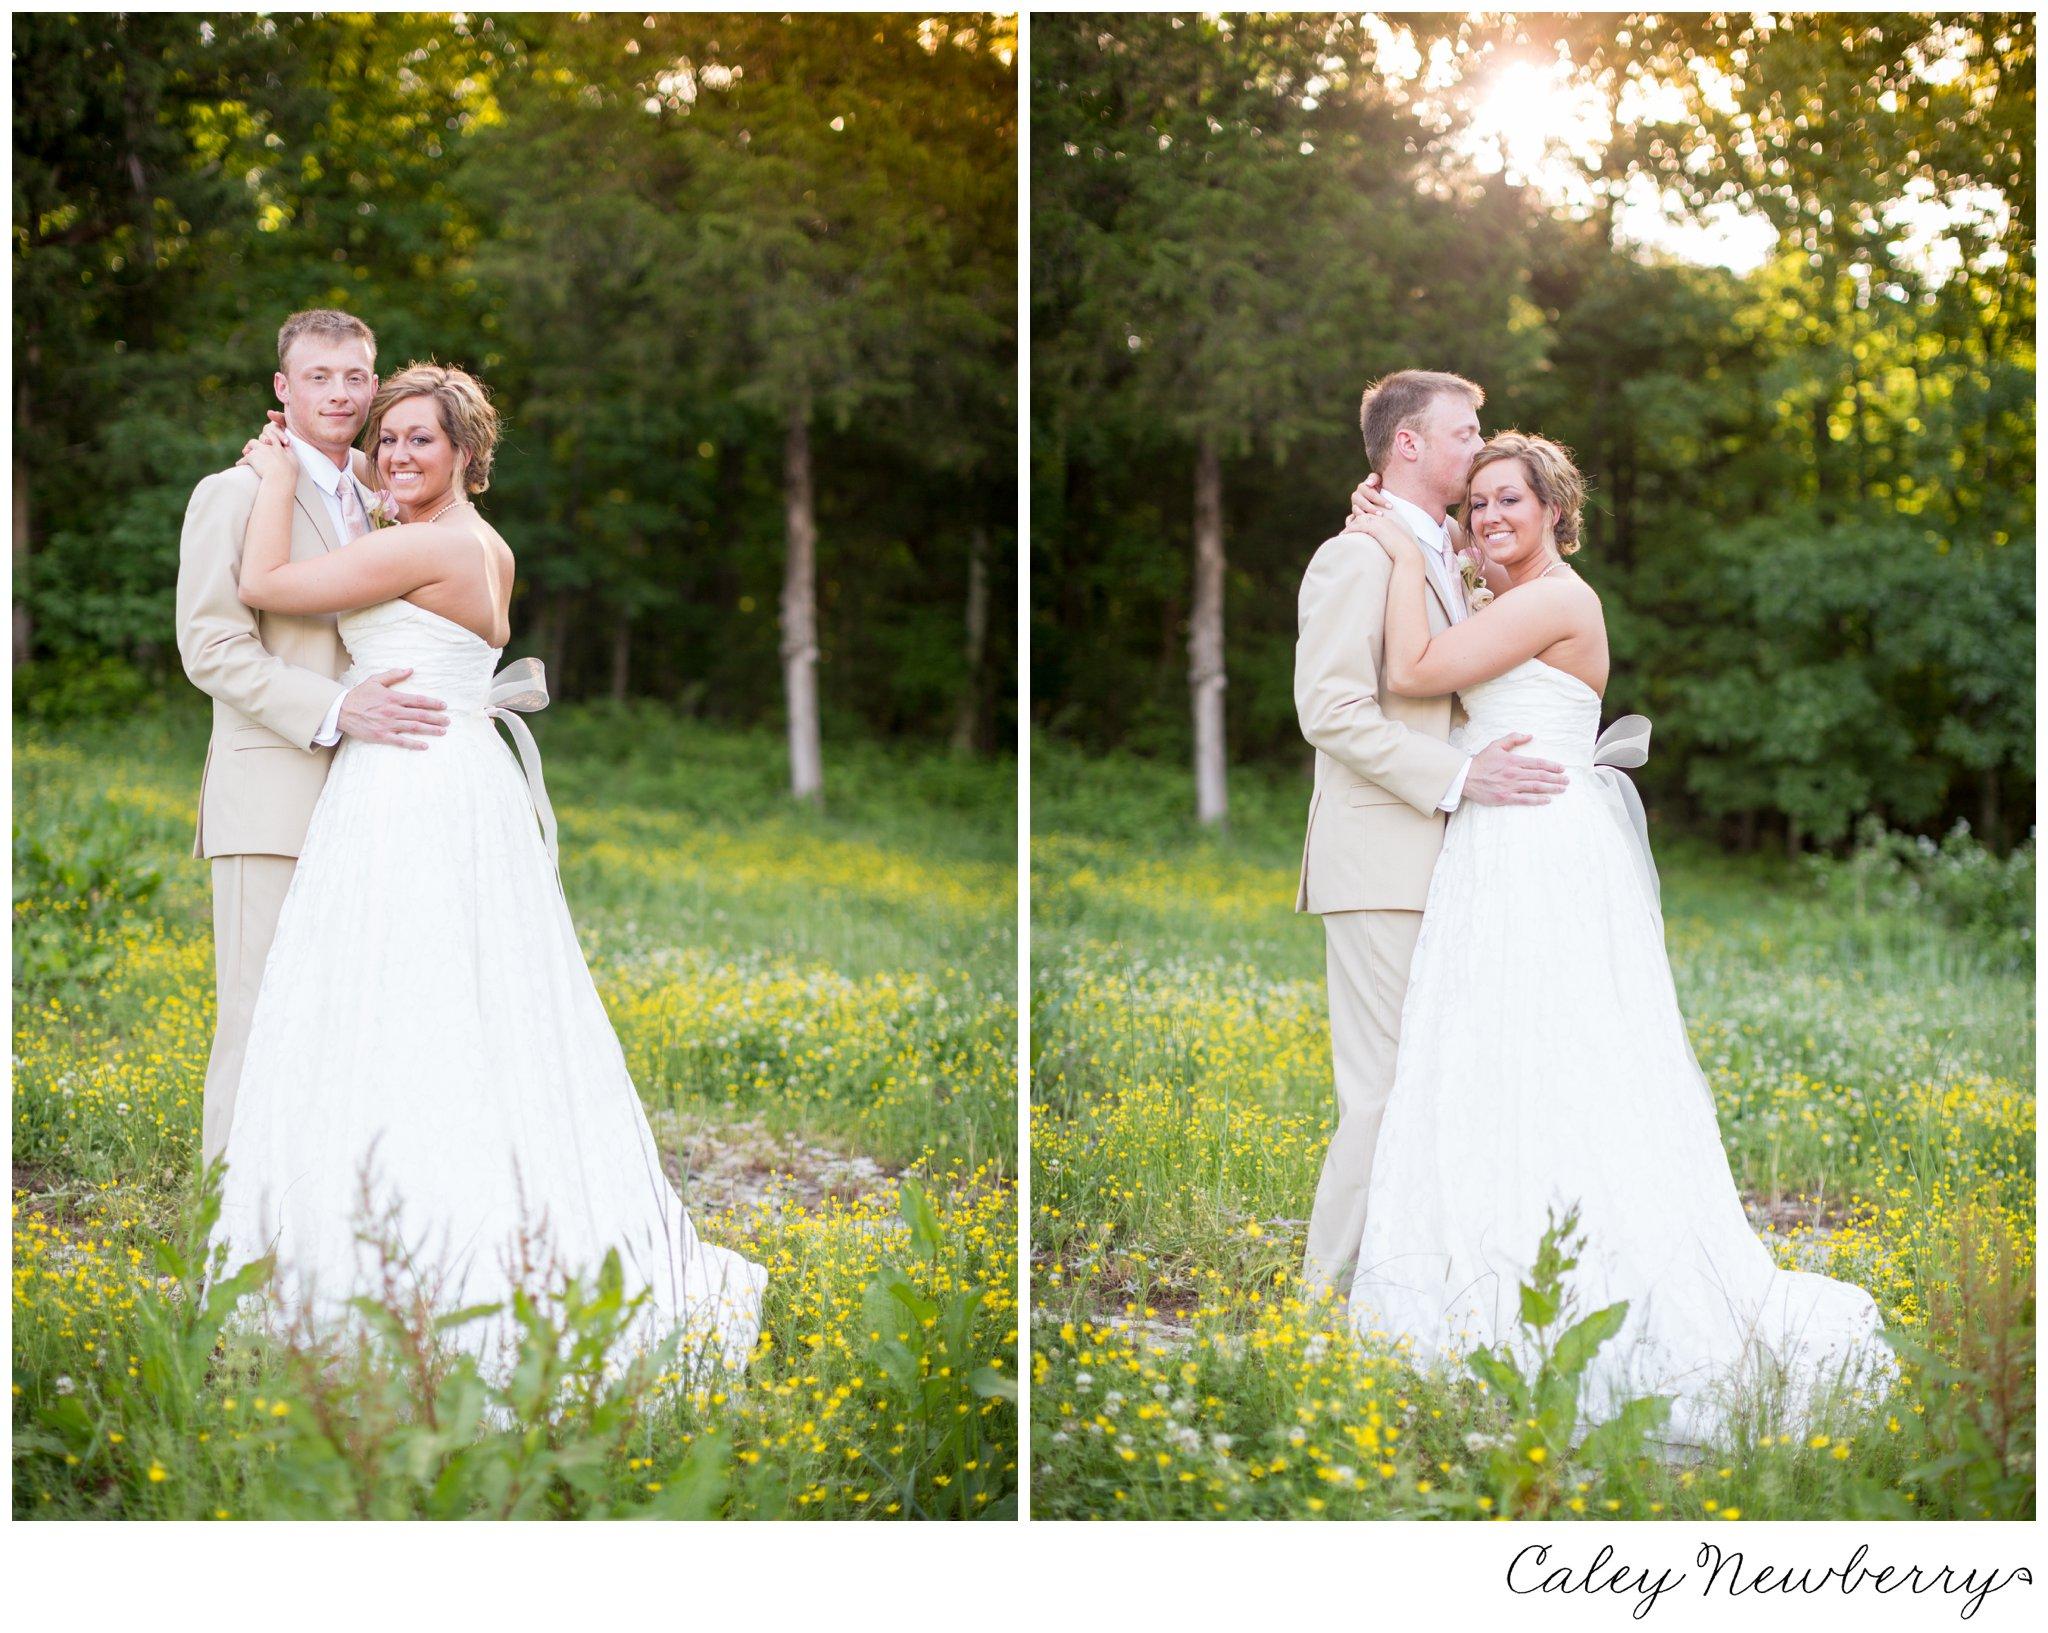 caley-newberry-wedding-photography-nashville.jpg